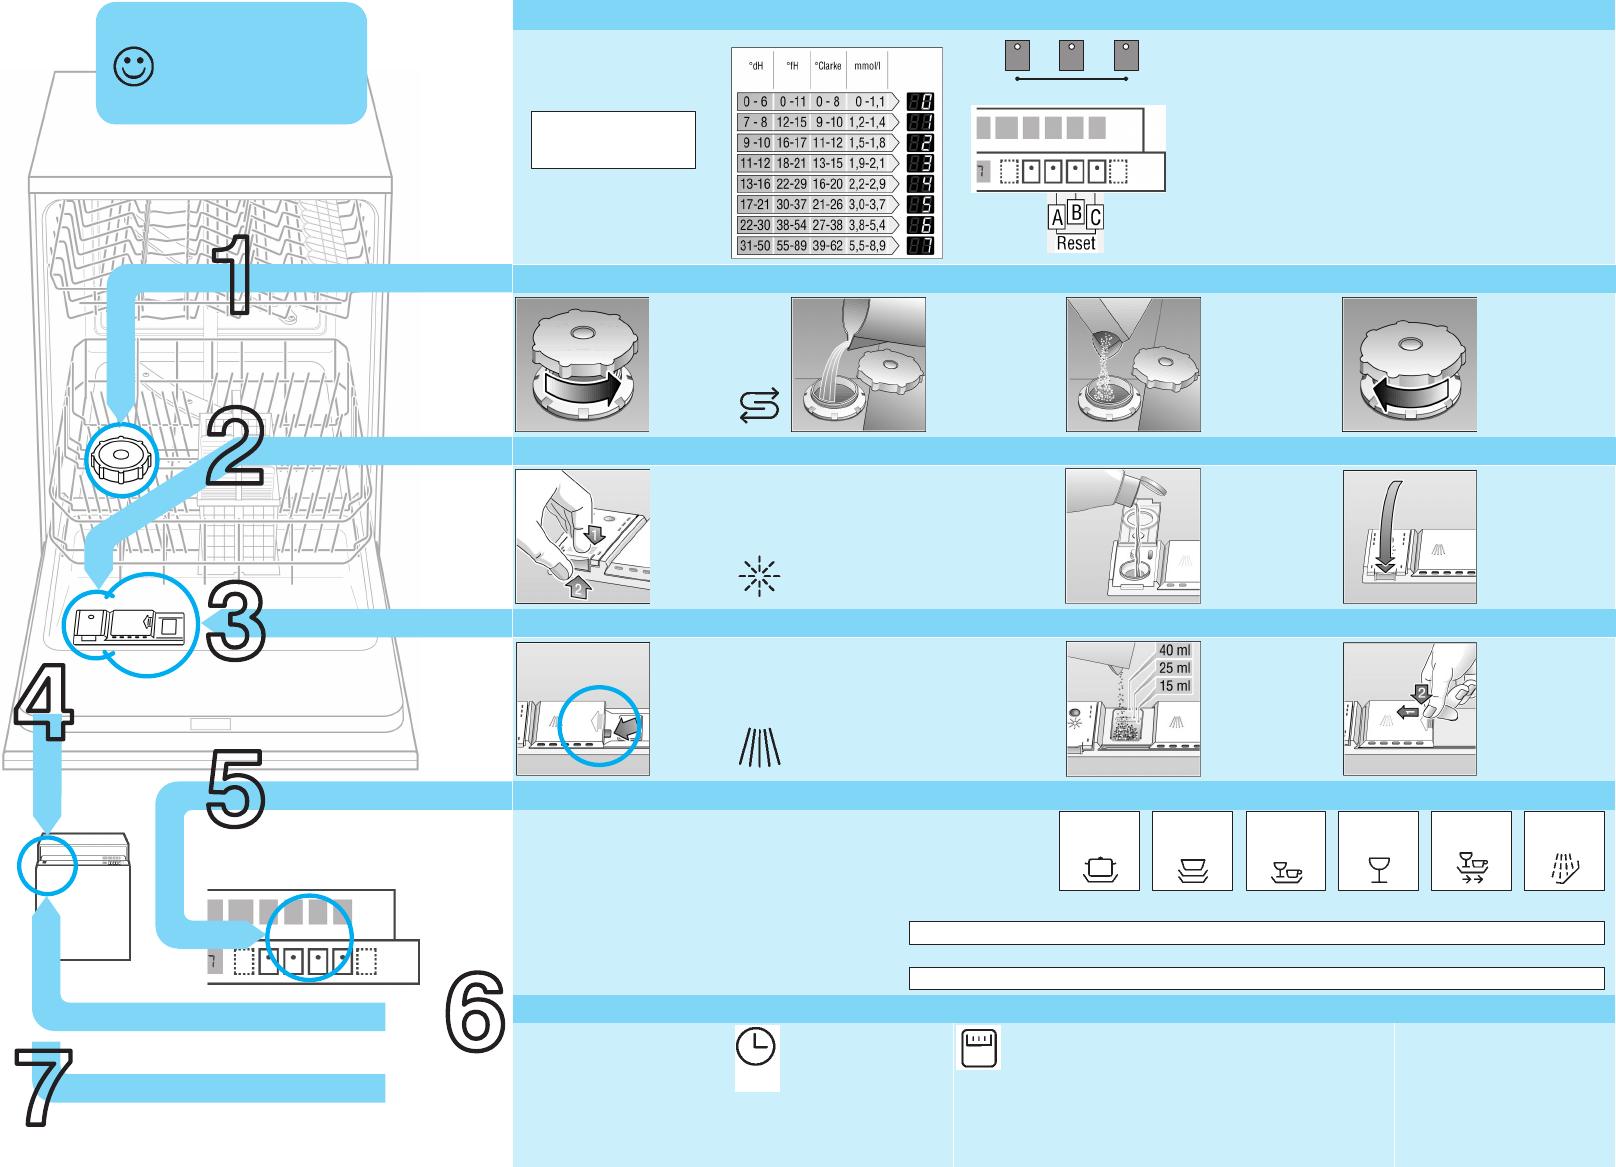 Bekend Handleiding Siemens SE64A560 (pagina 1 van 2) (Nederlands) QL67